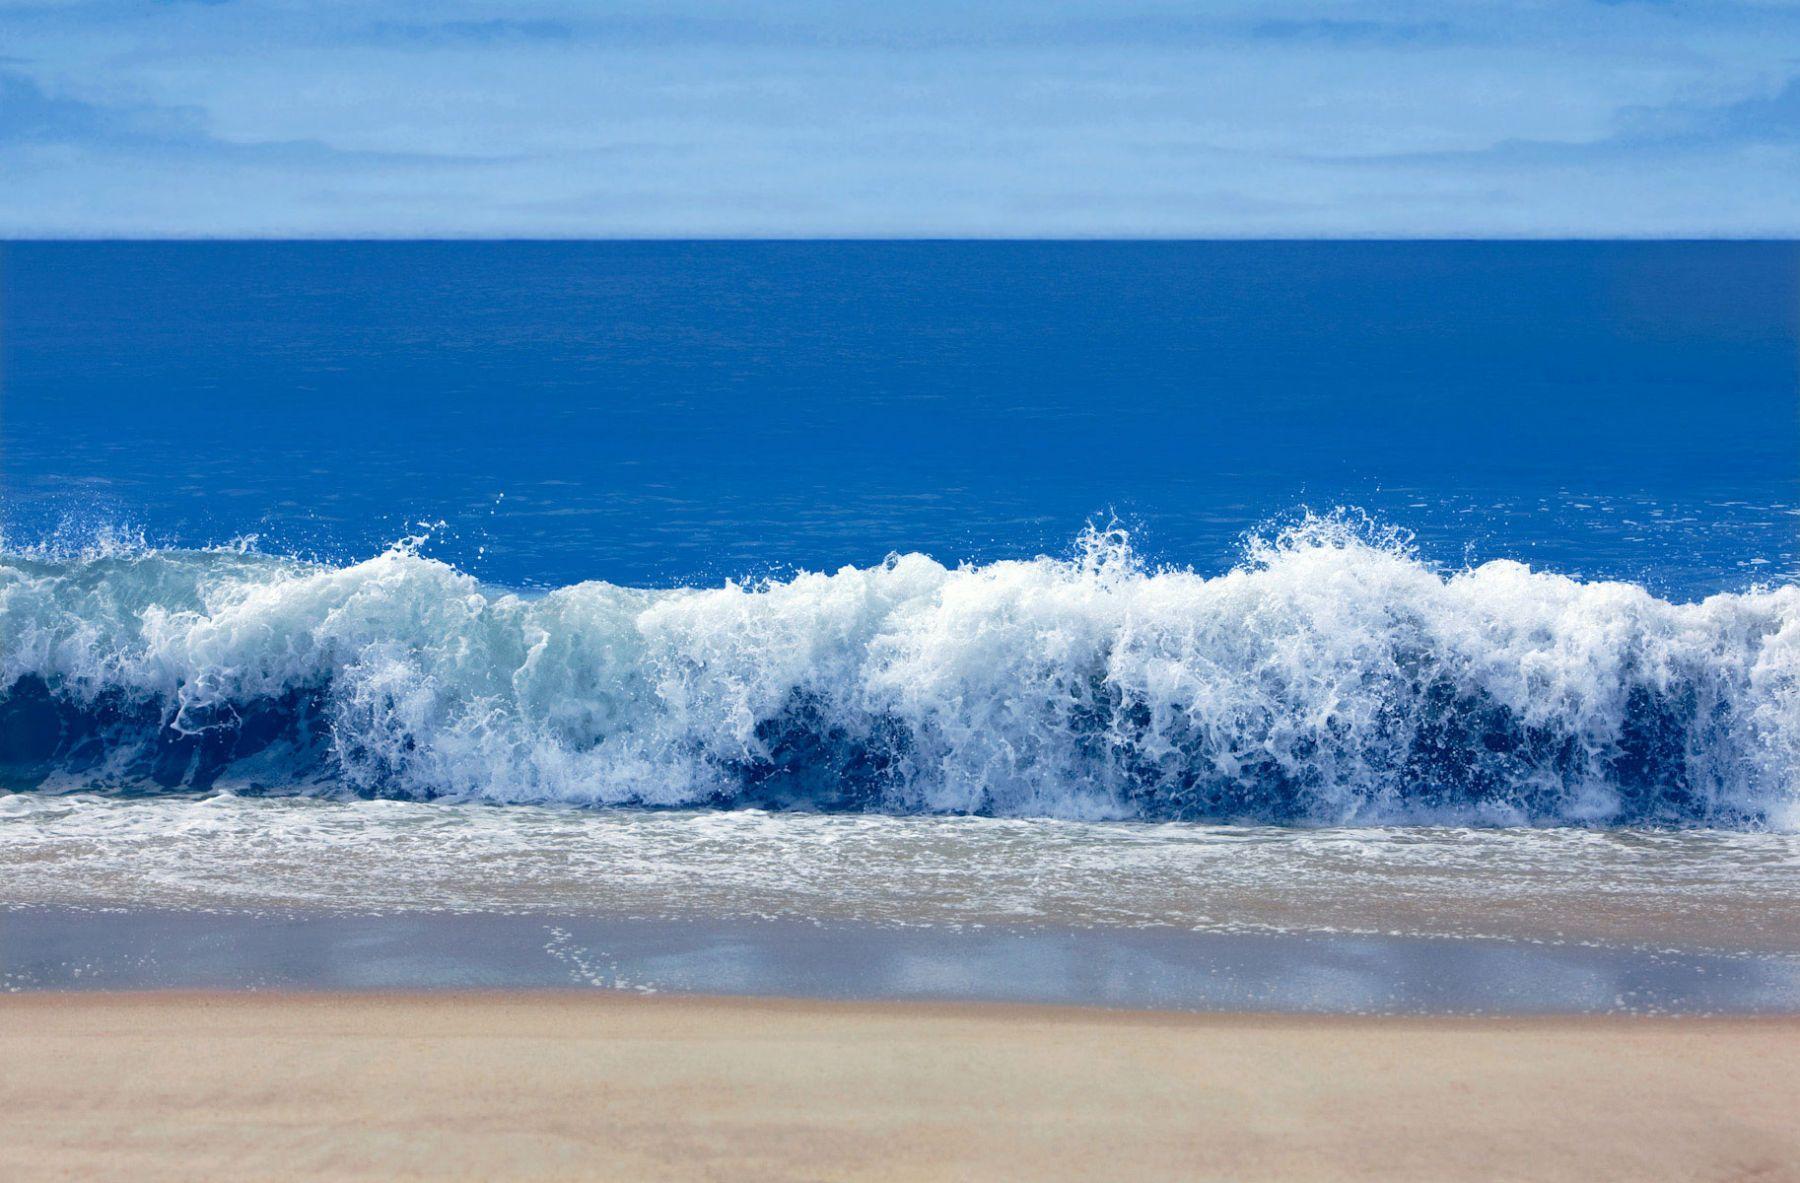 Crashing Waves with Sand